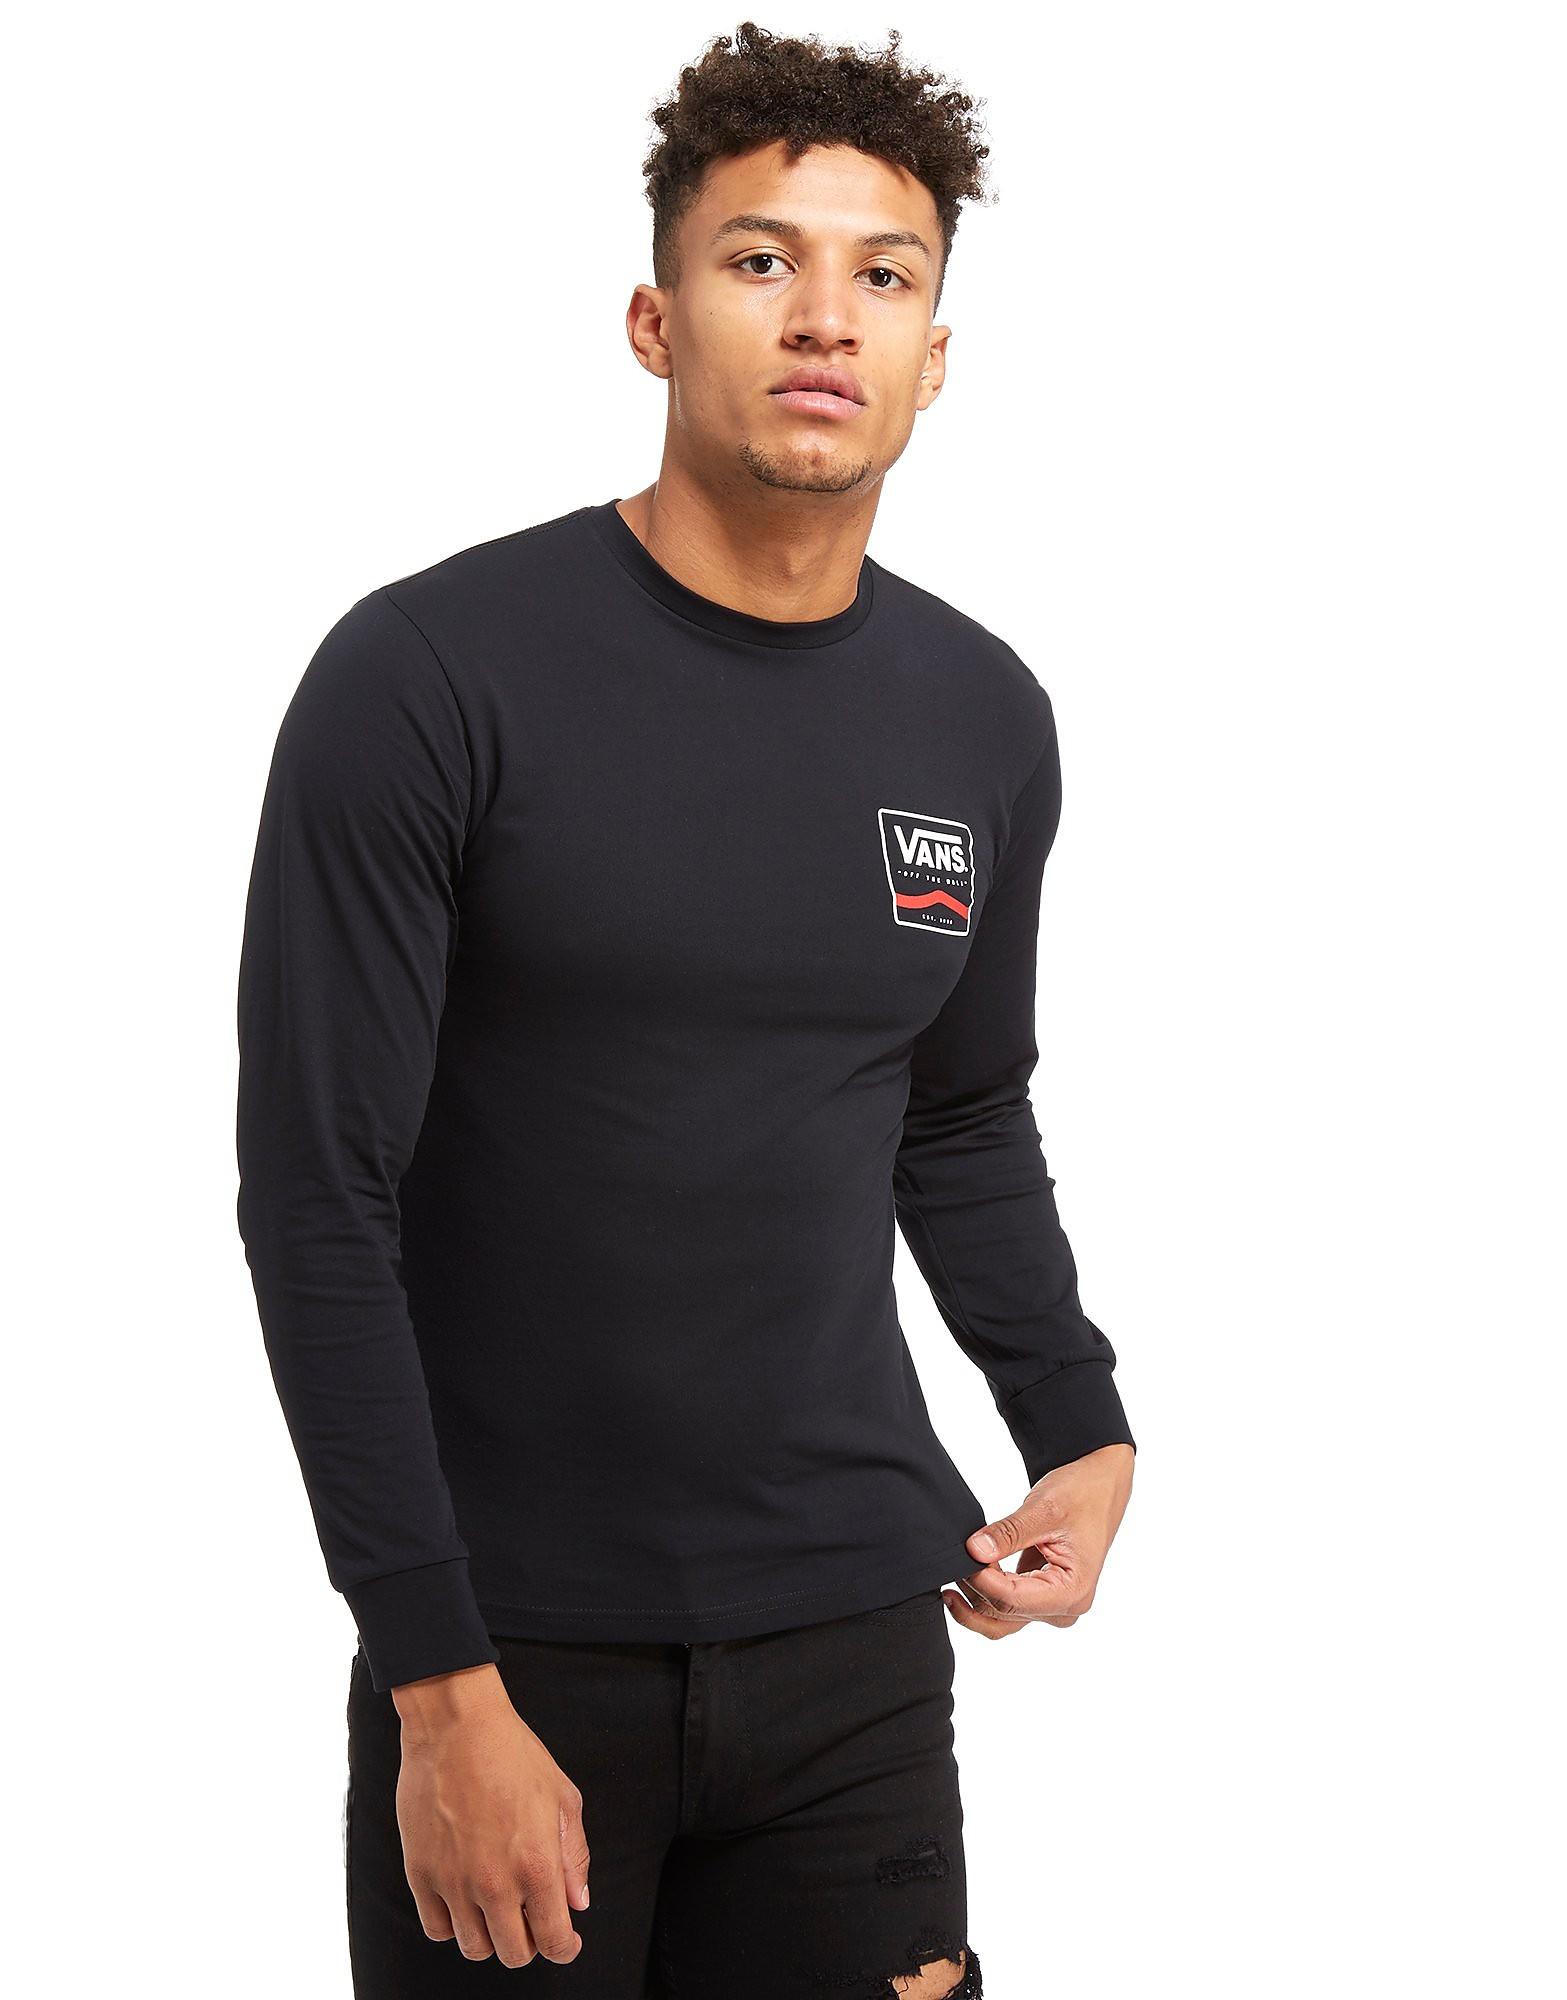 Vans Side Stripe T-Shirt